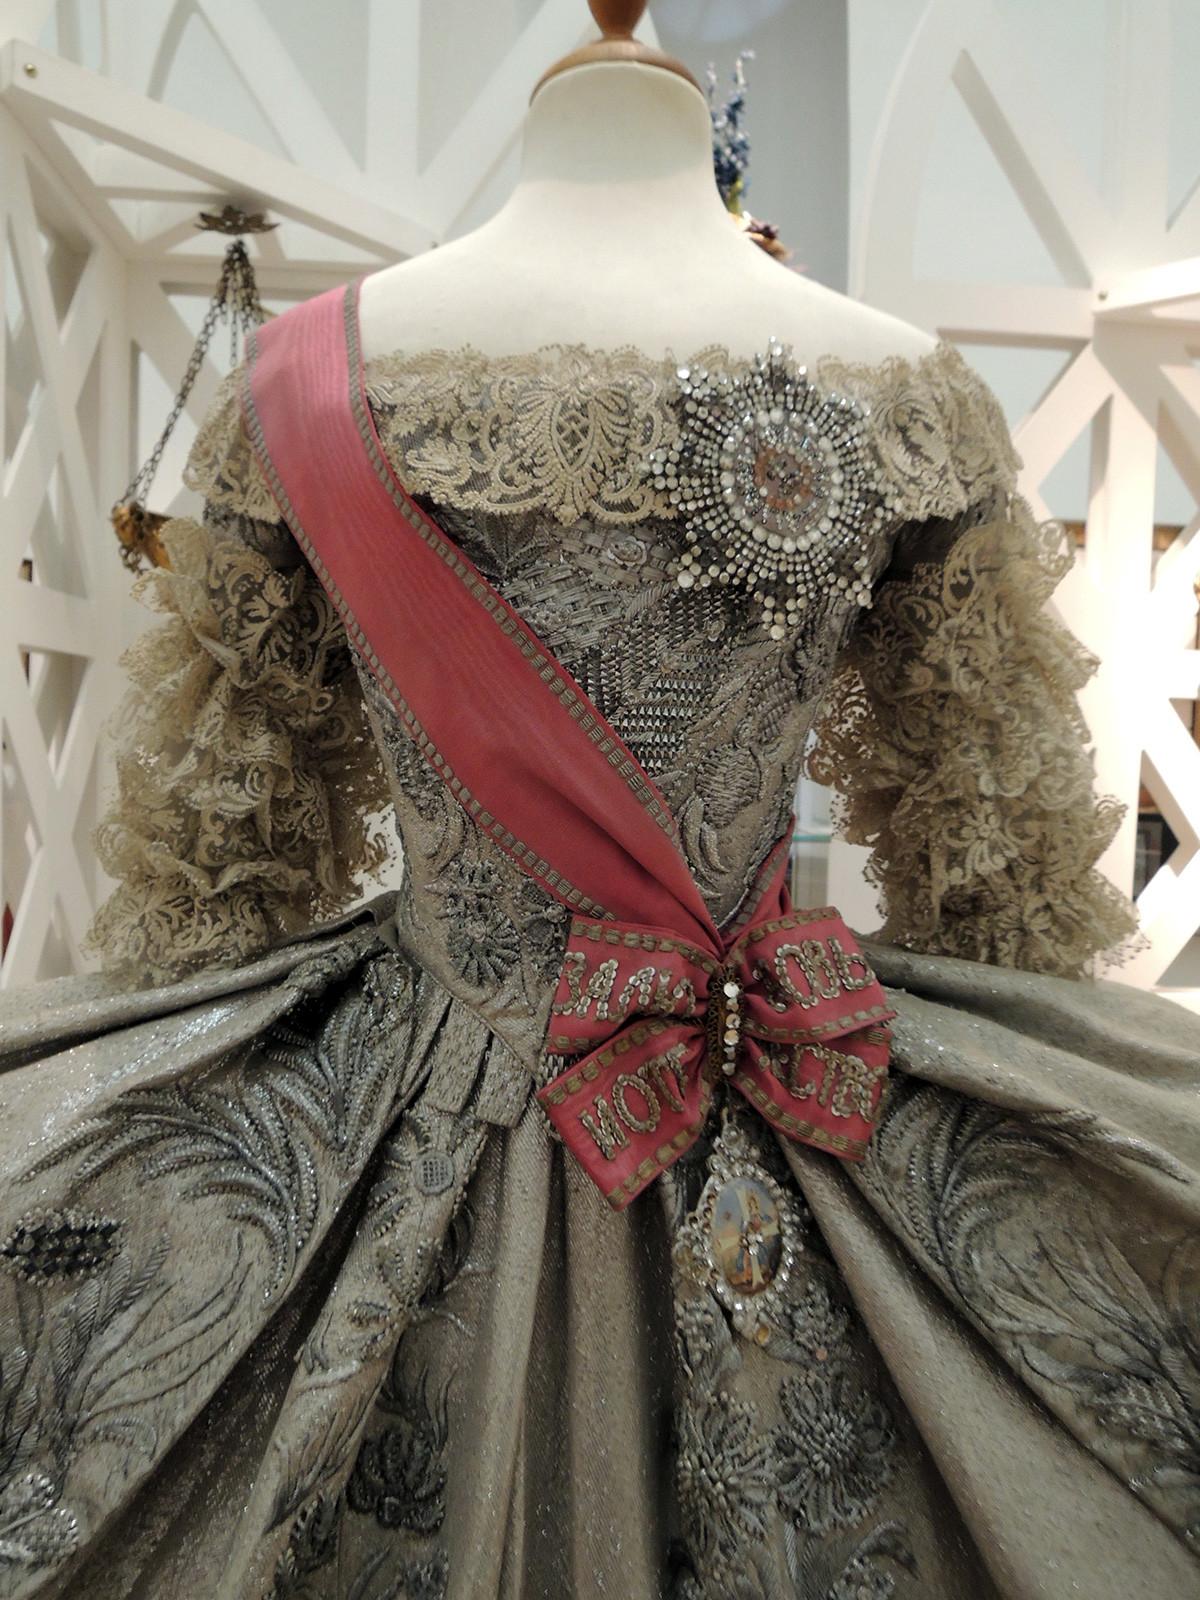 Réplique de la robe de mariage de la future impératrice Catherine II.